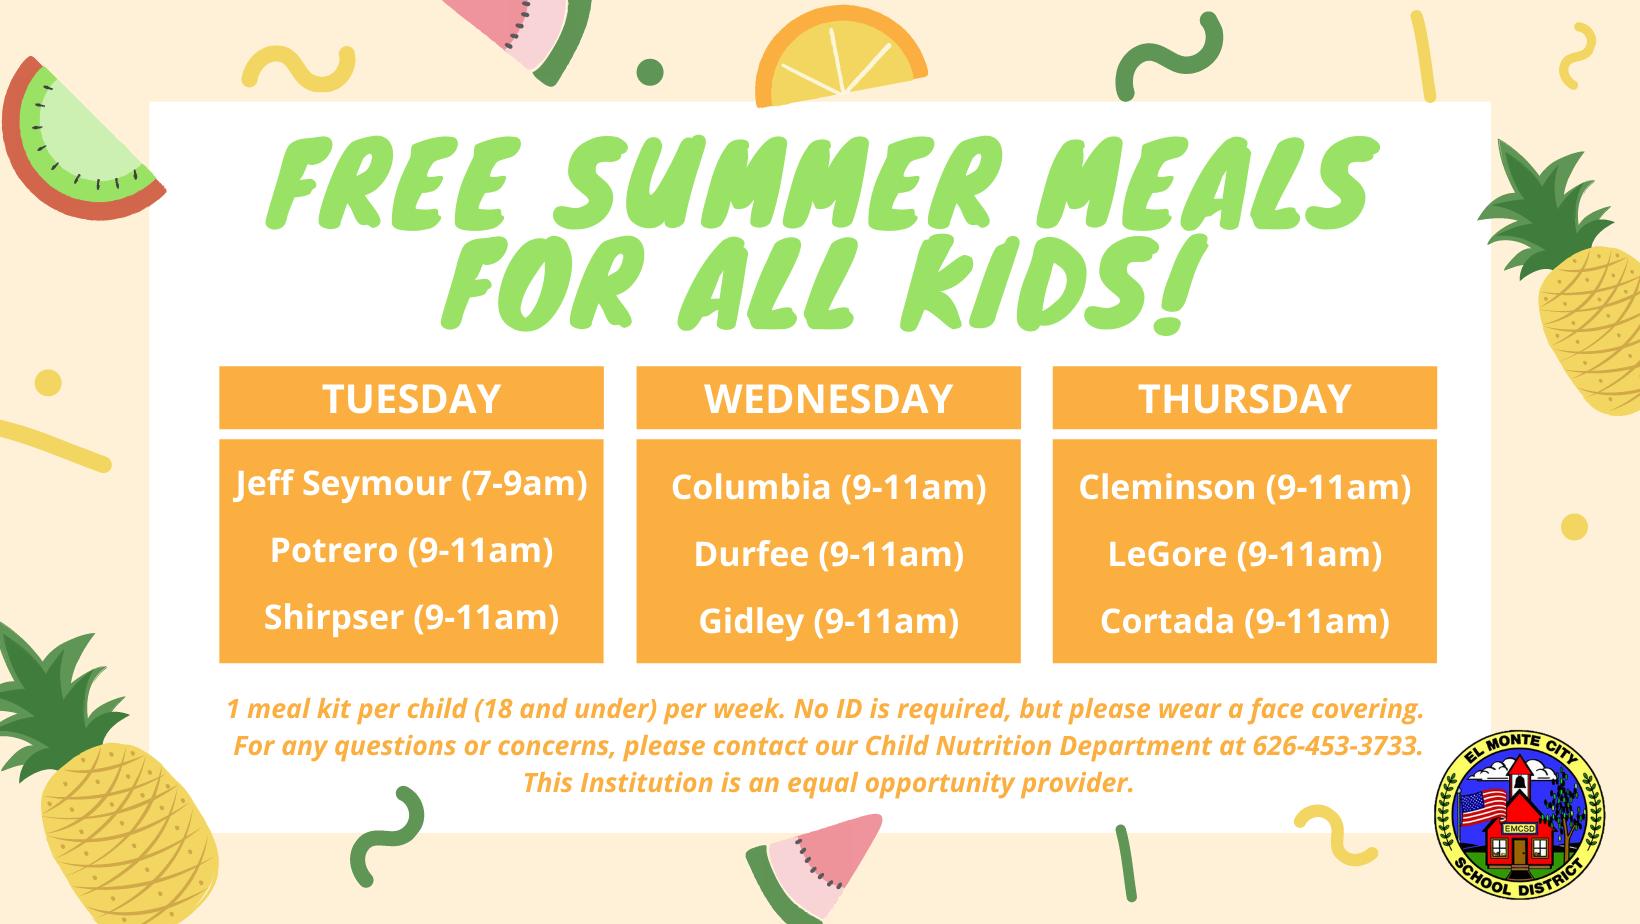 Free Meals for All Kids are available for pick up weekly Tuesdays (Jeff Seymour 7-9am, Potrero 9-11am, Shirpser 9-11am), Wednesdays (Columbia 9-11am, Durfee 9-11am, Gidley 9-11am), Thursdays (Cleminson 9-11am, LeGore 9-11am, Cortada 9-11am)